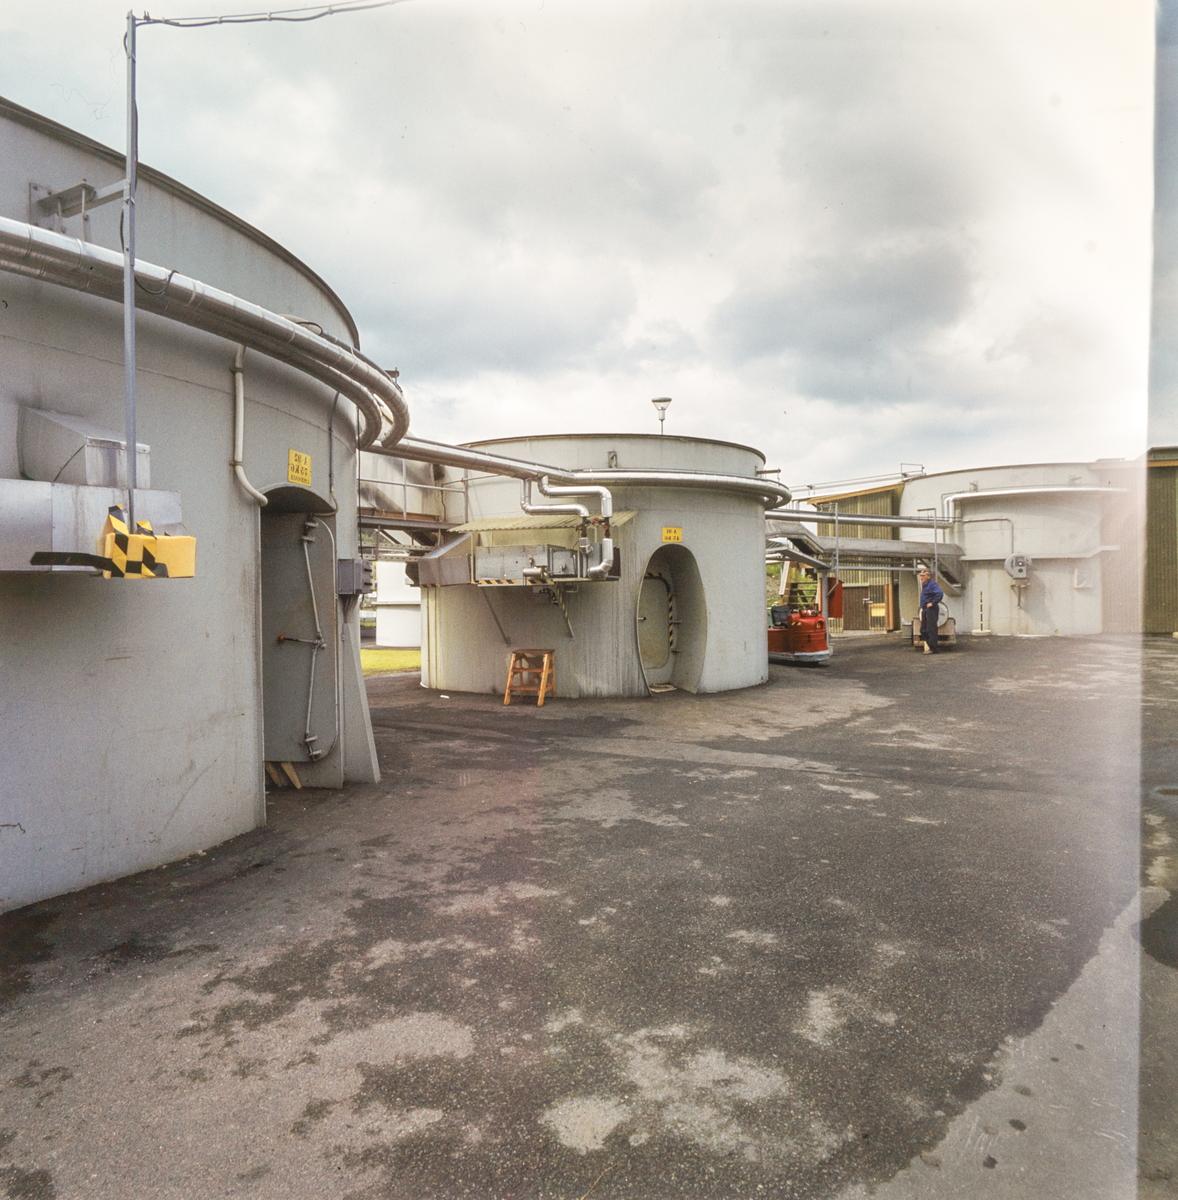 Group no. 64-60-00-00 Picture no. 535934..Sprengstoff produksjon .sylindriske hus